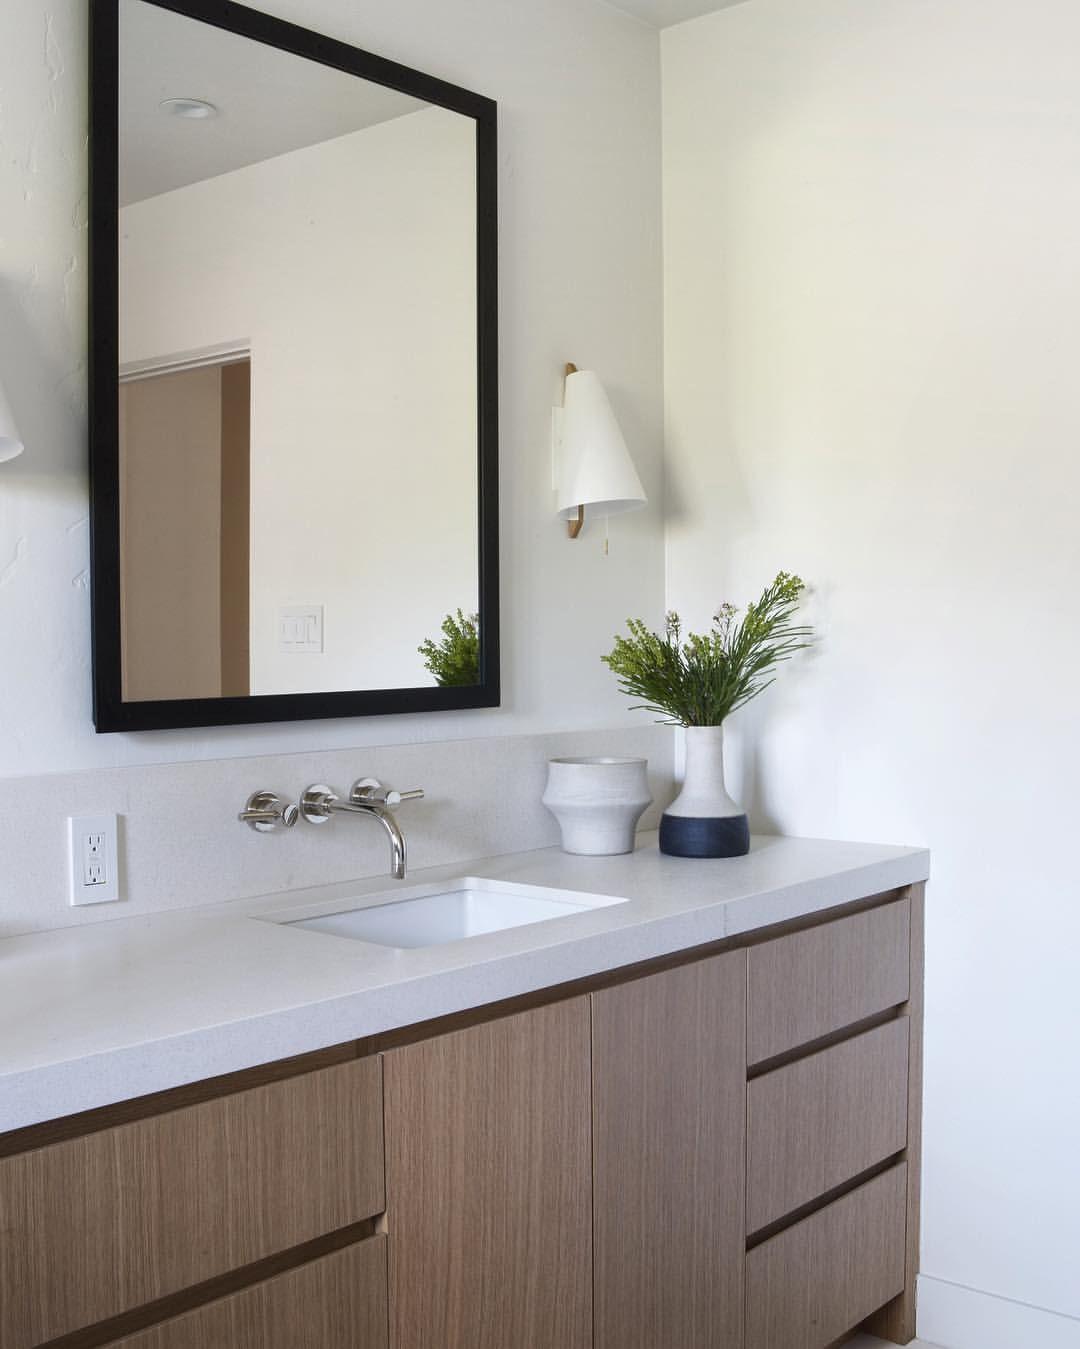 Disc Interiors | Cuartos de Baño y Cocina | Pinterest | Interiors ...